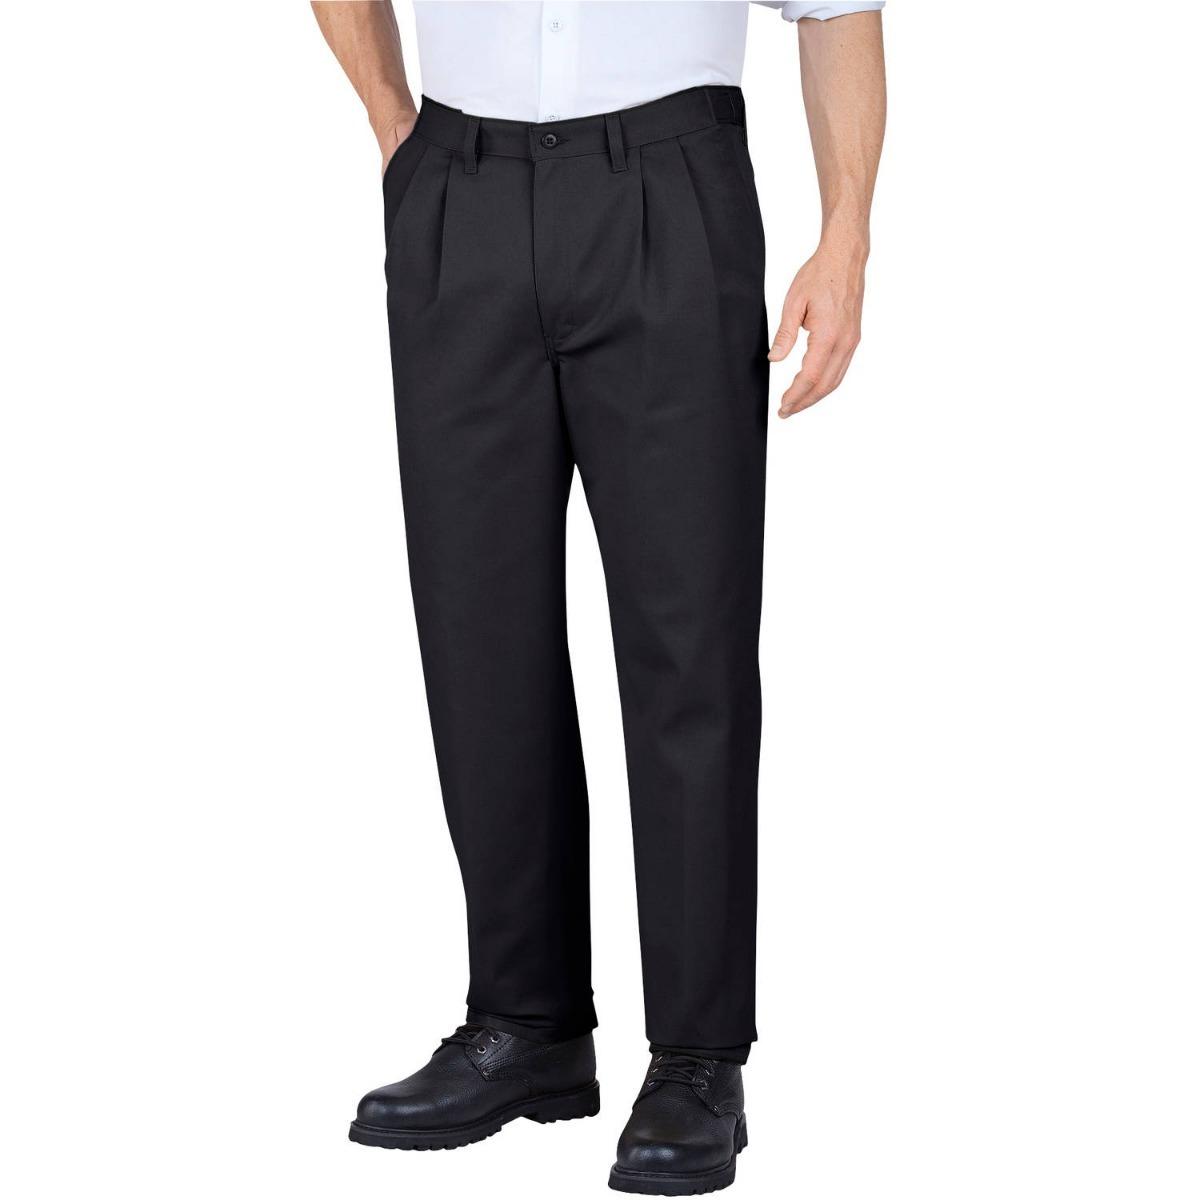 9d03a9566 ... kit.4 calça social masculina